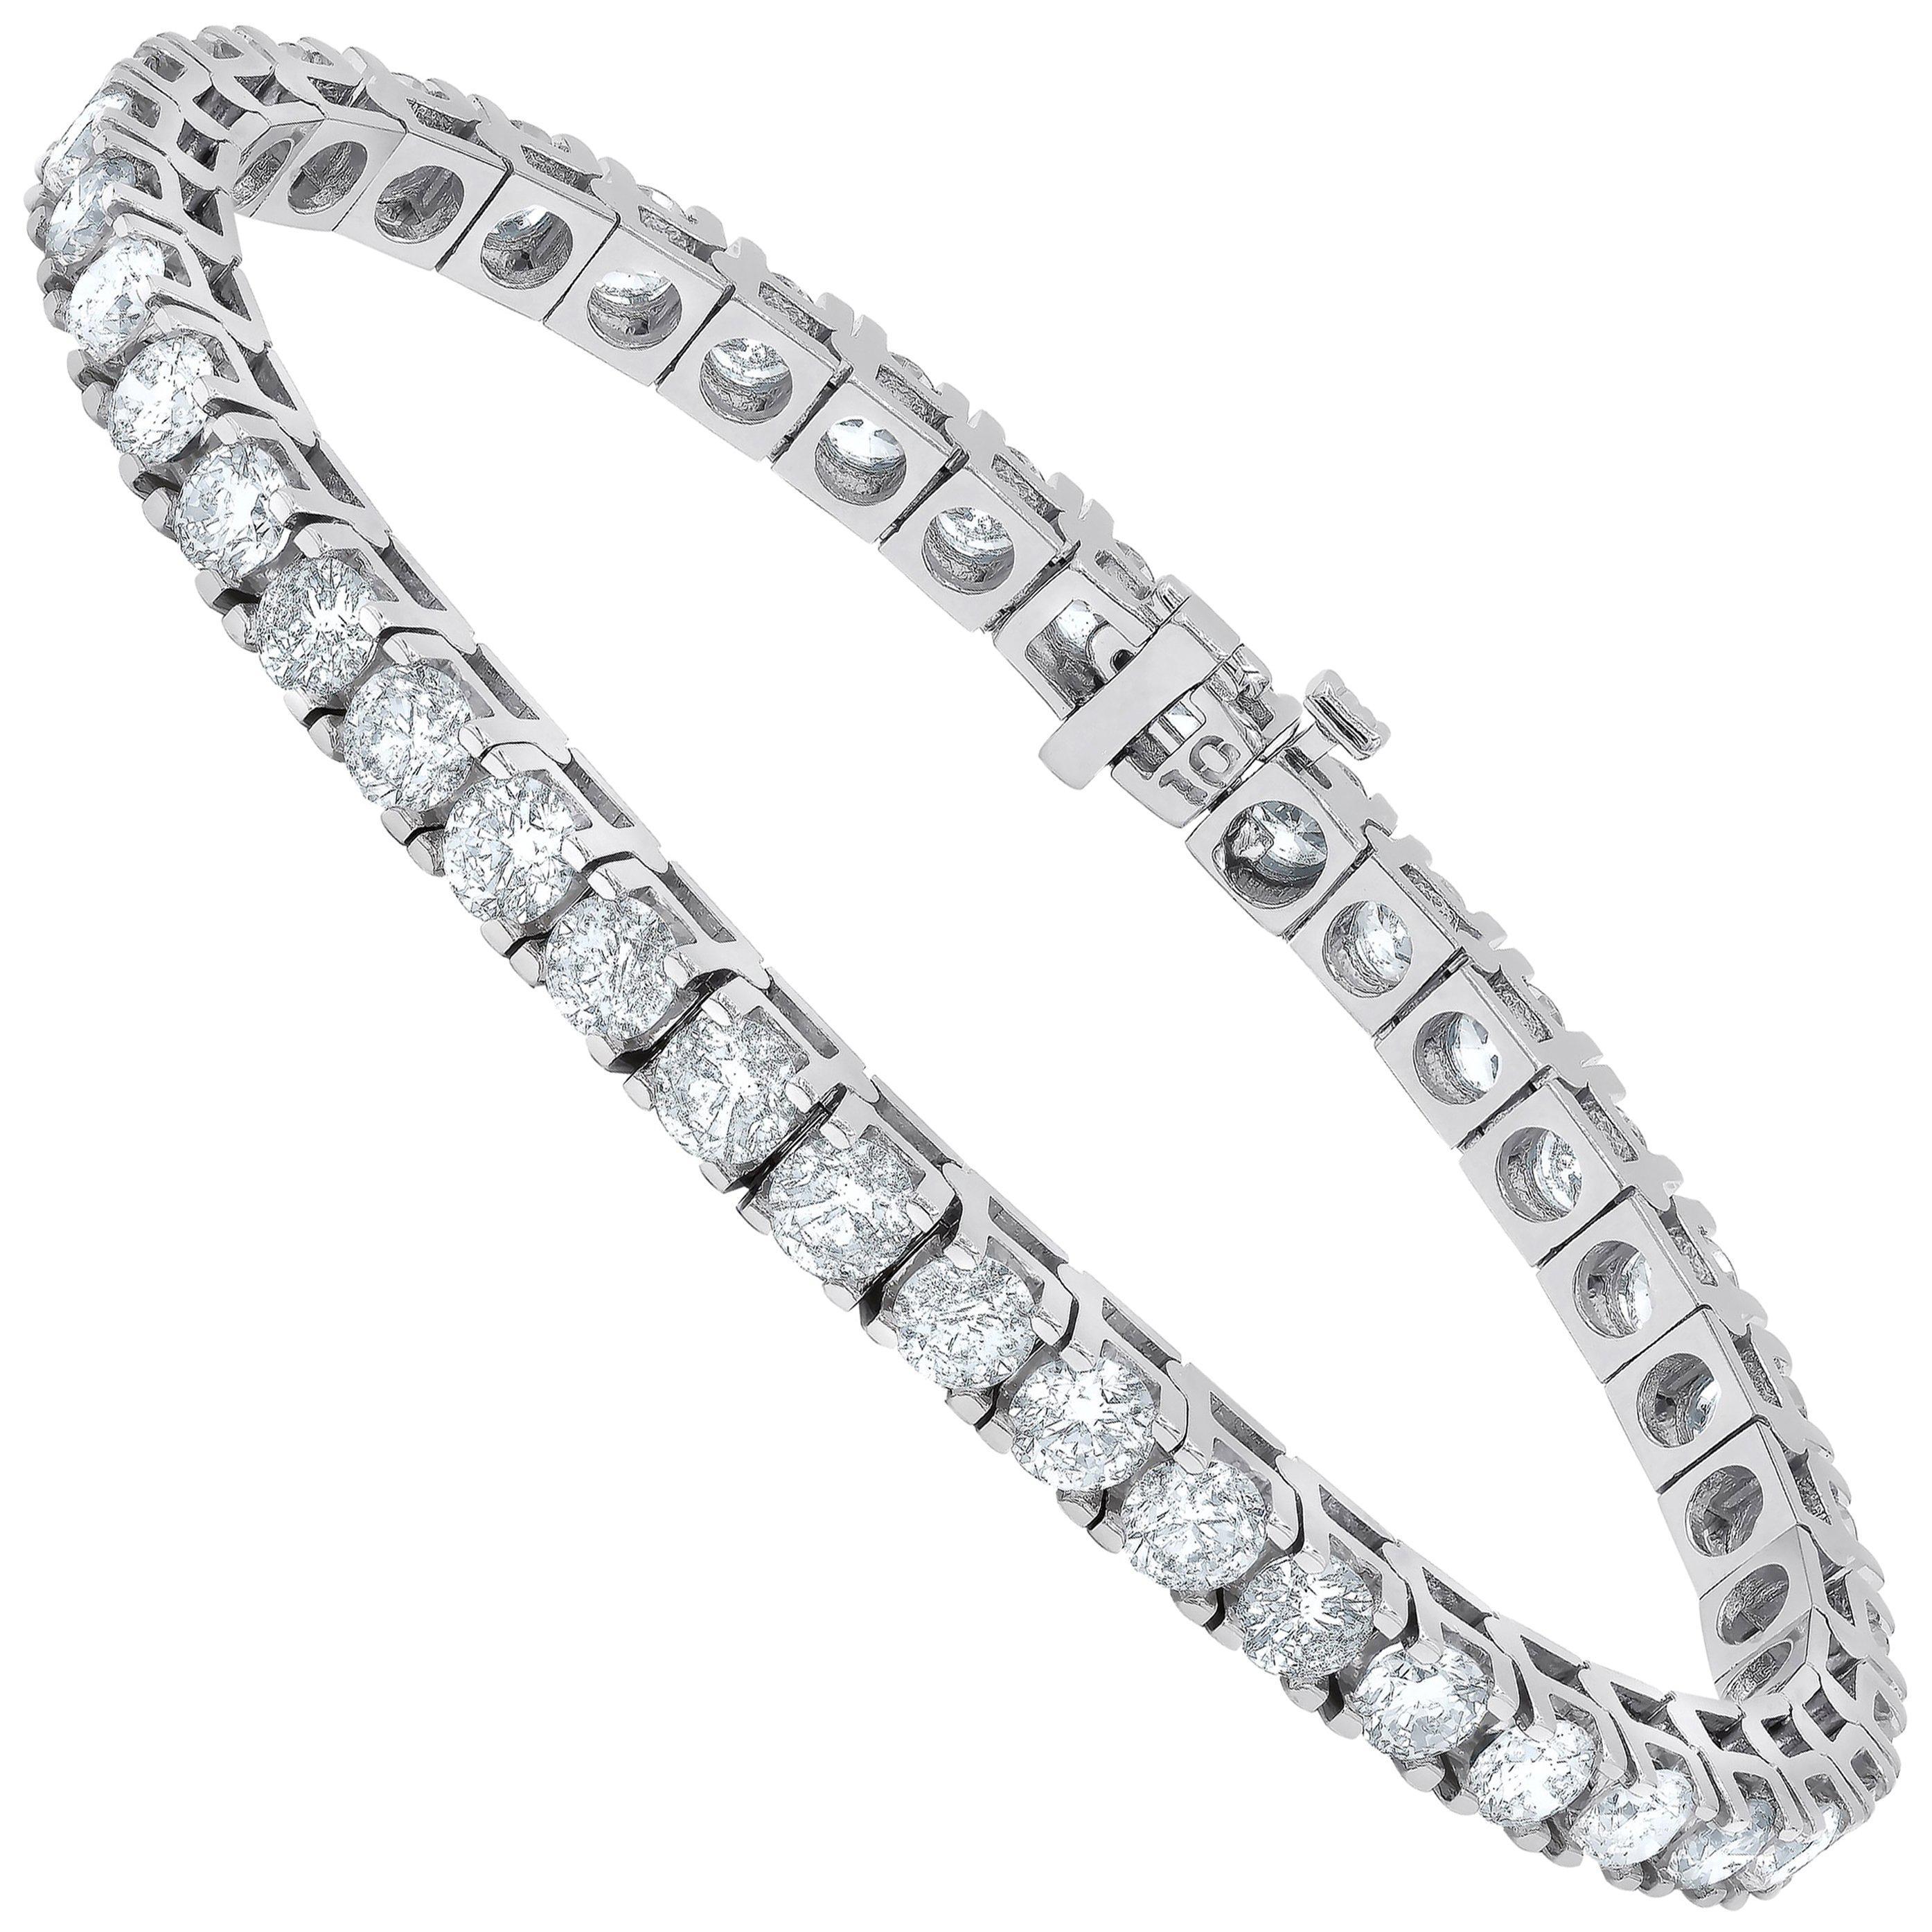 6.00 Carat Diamond Tennis Bracelet in White gold